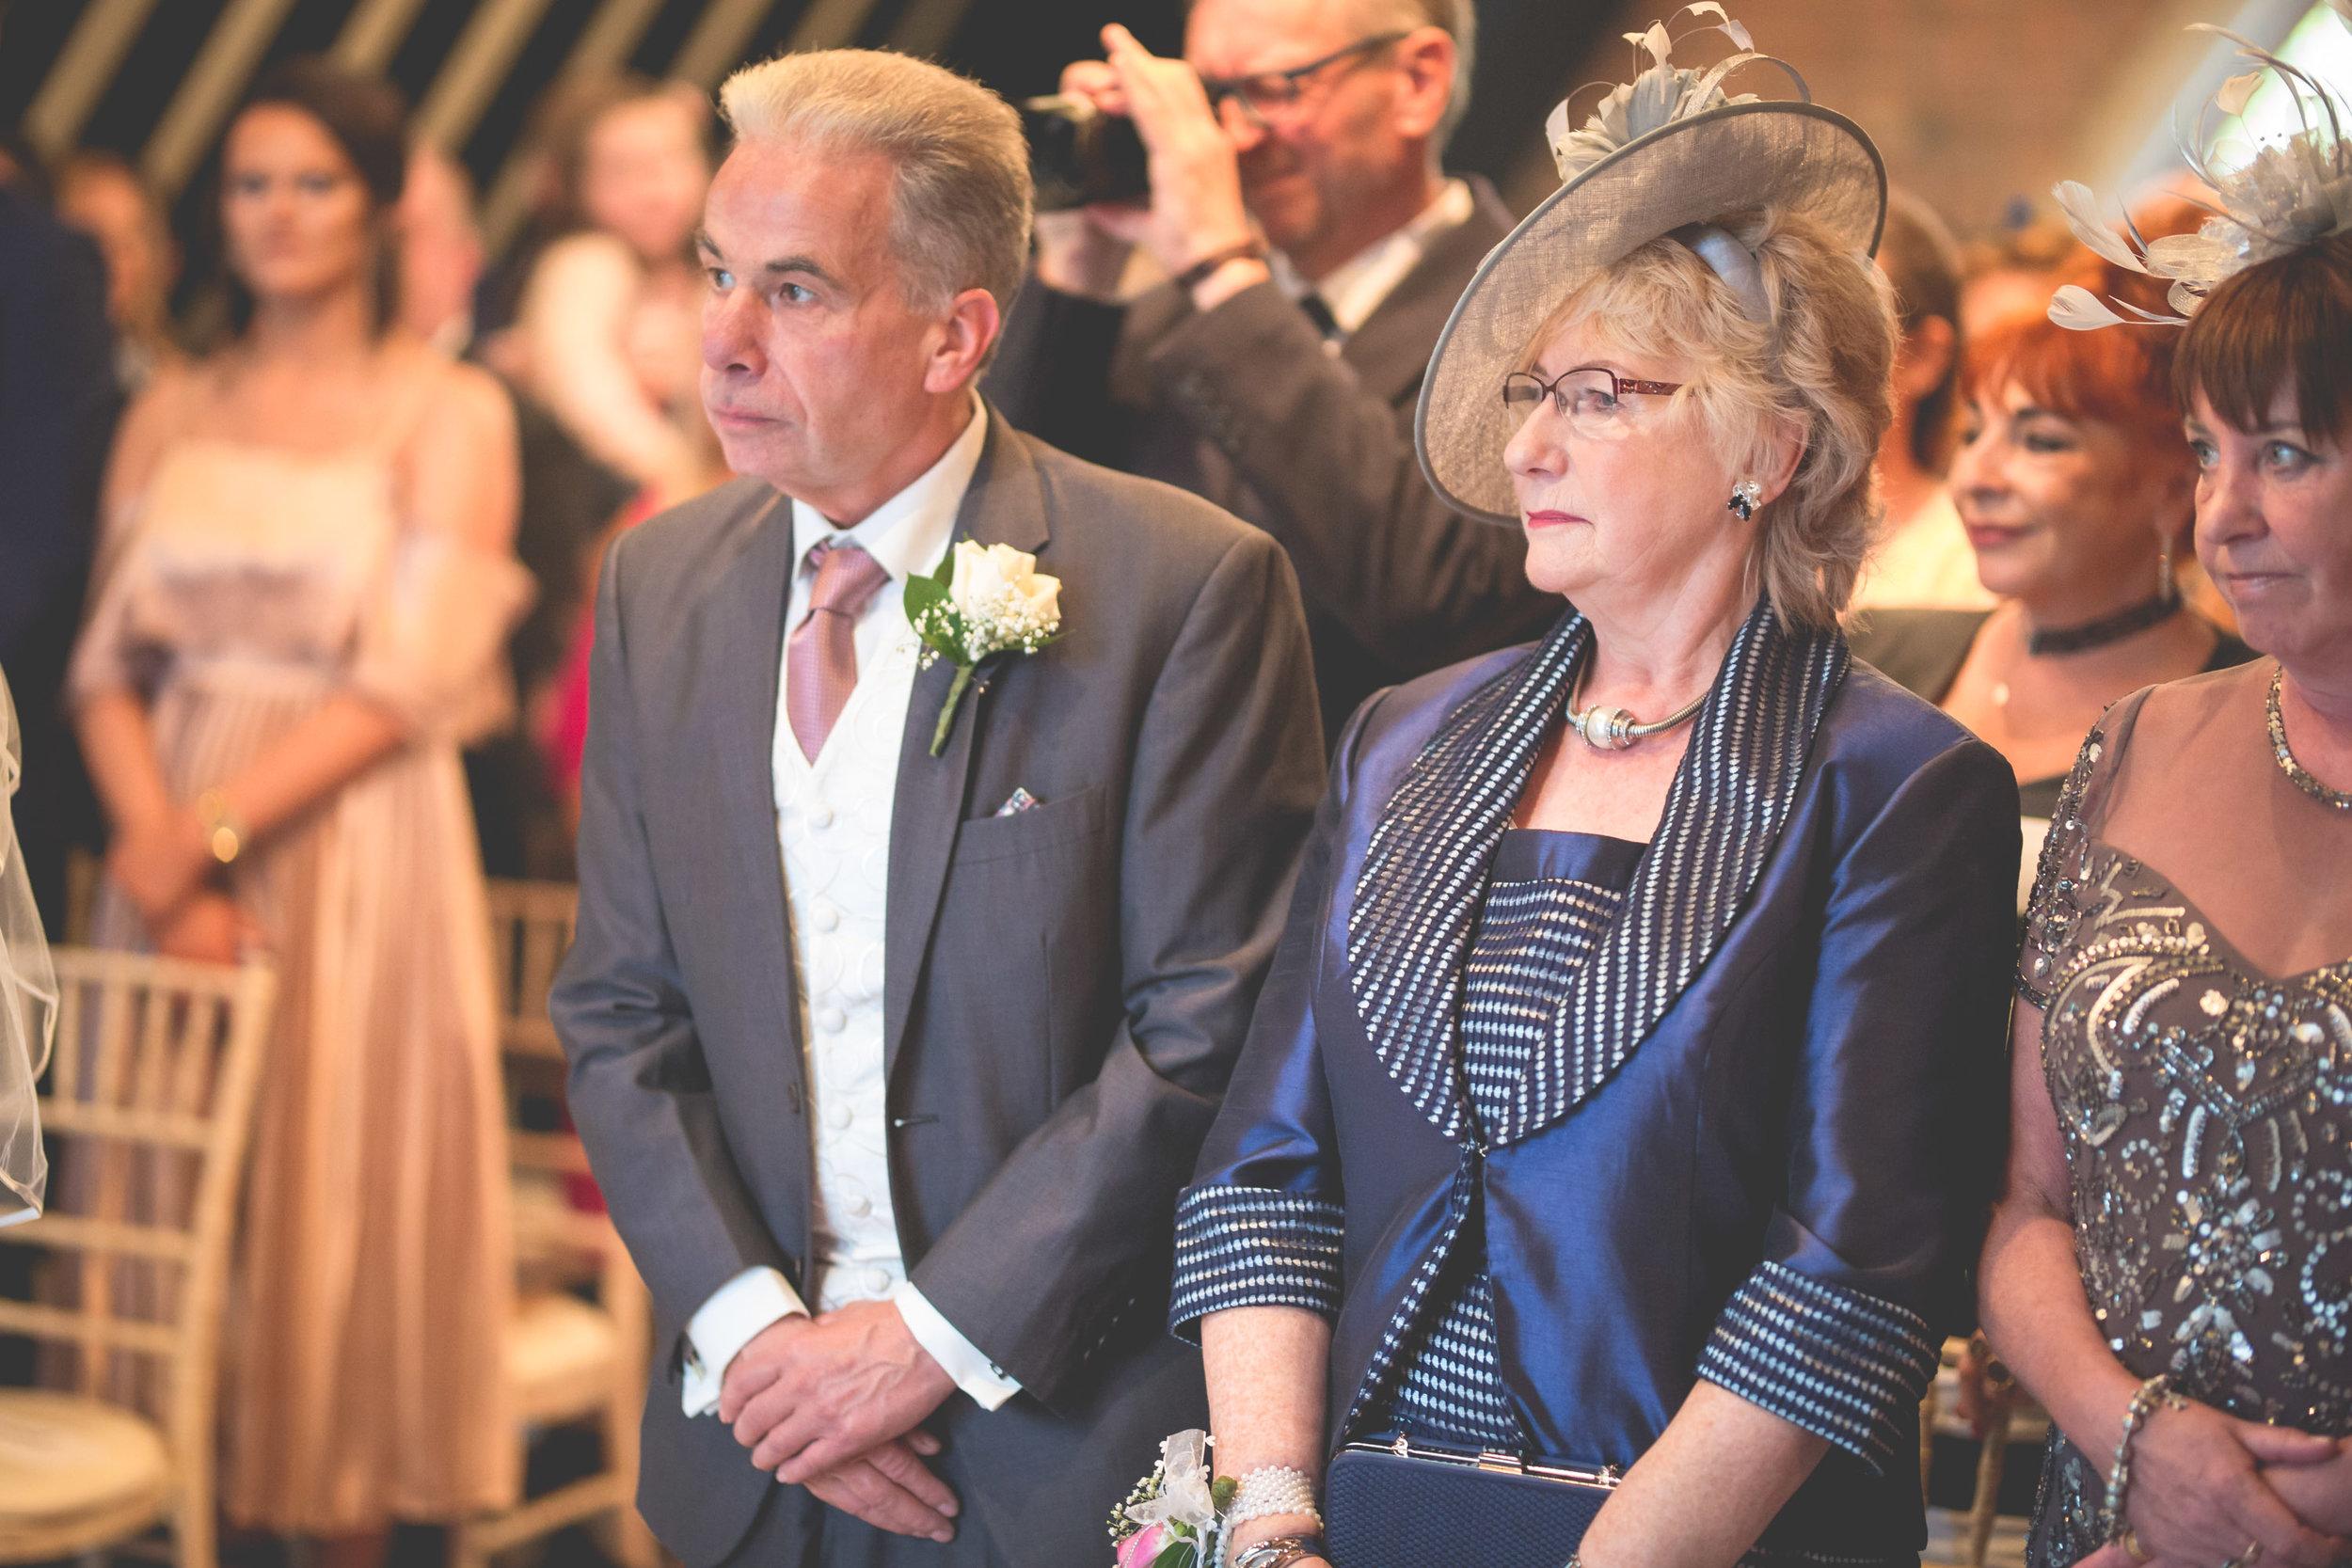 Helena & Terence - Ceremony-59.jpg